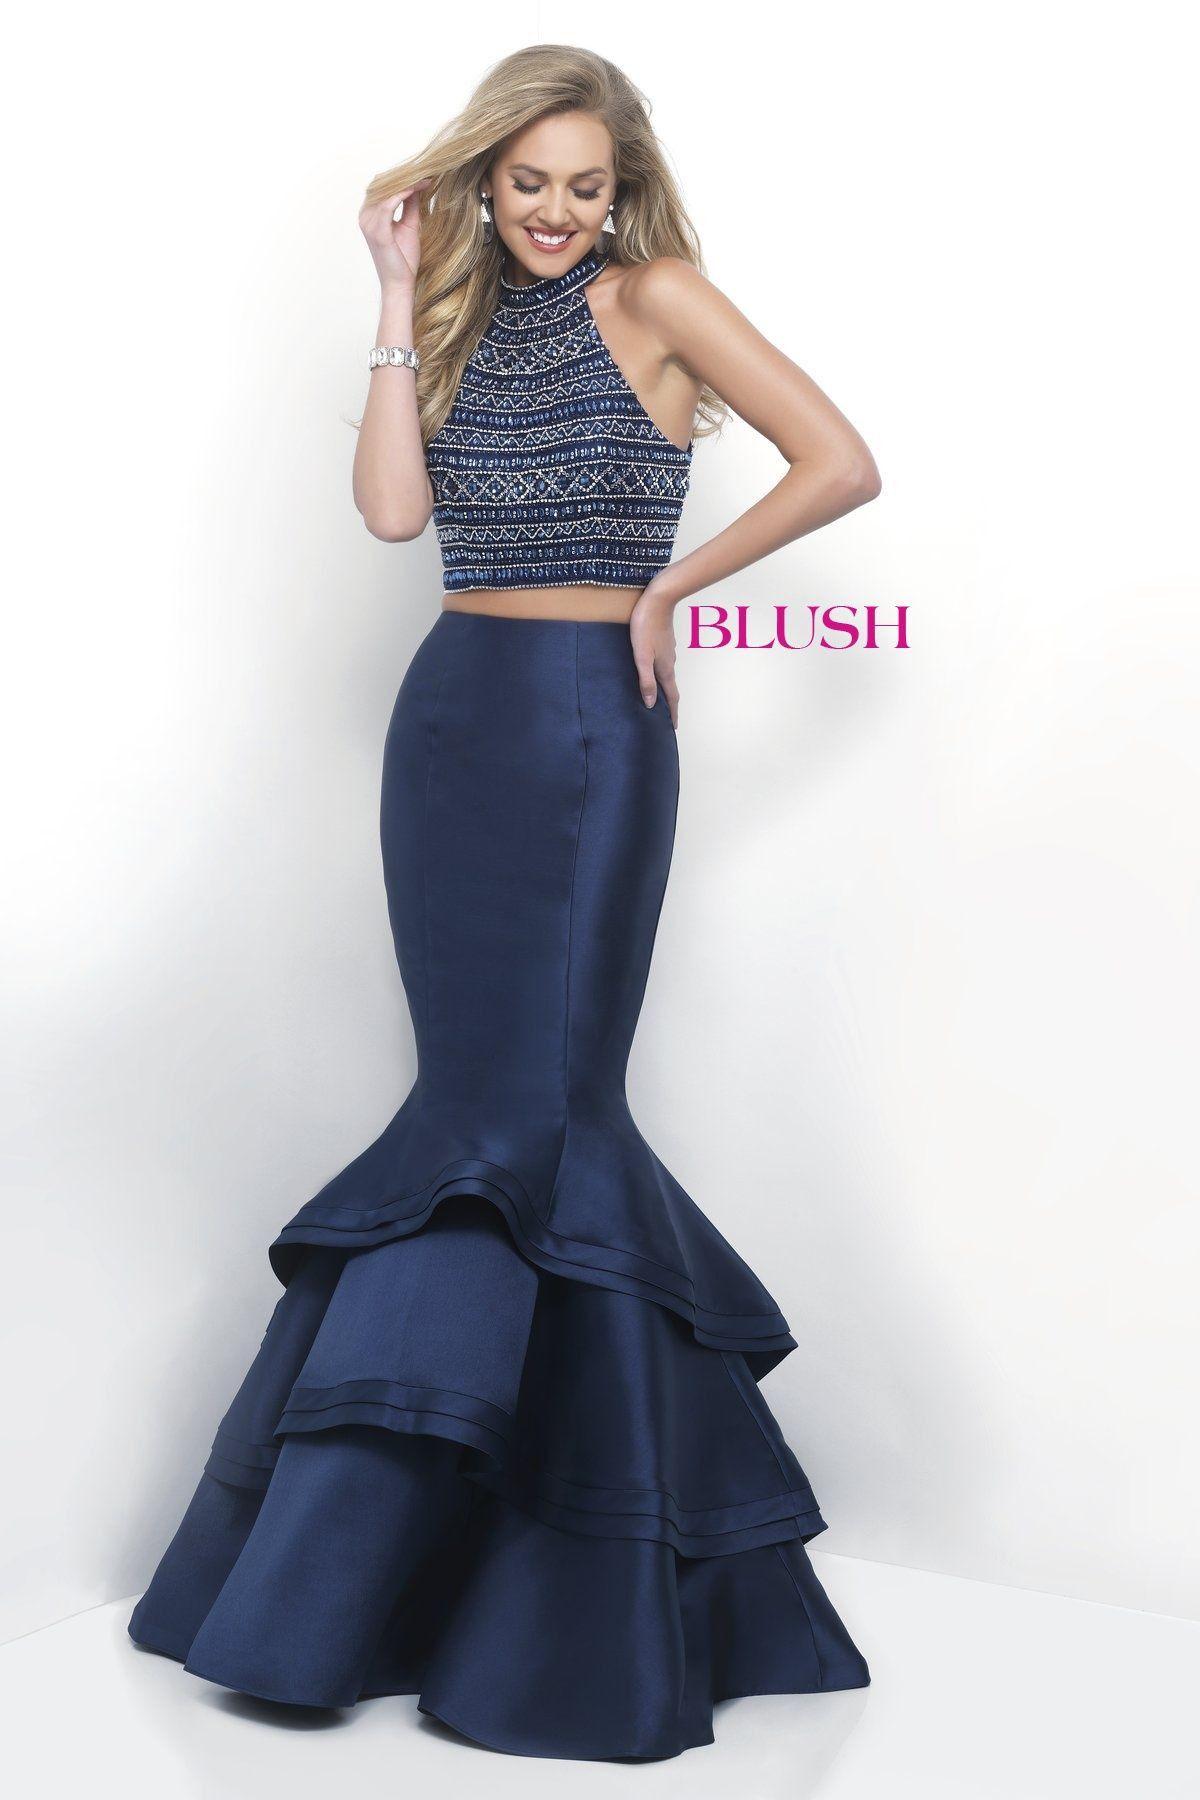 Blush prom 11254 prom dresses piece prom dress blush